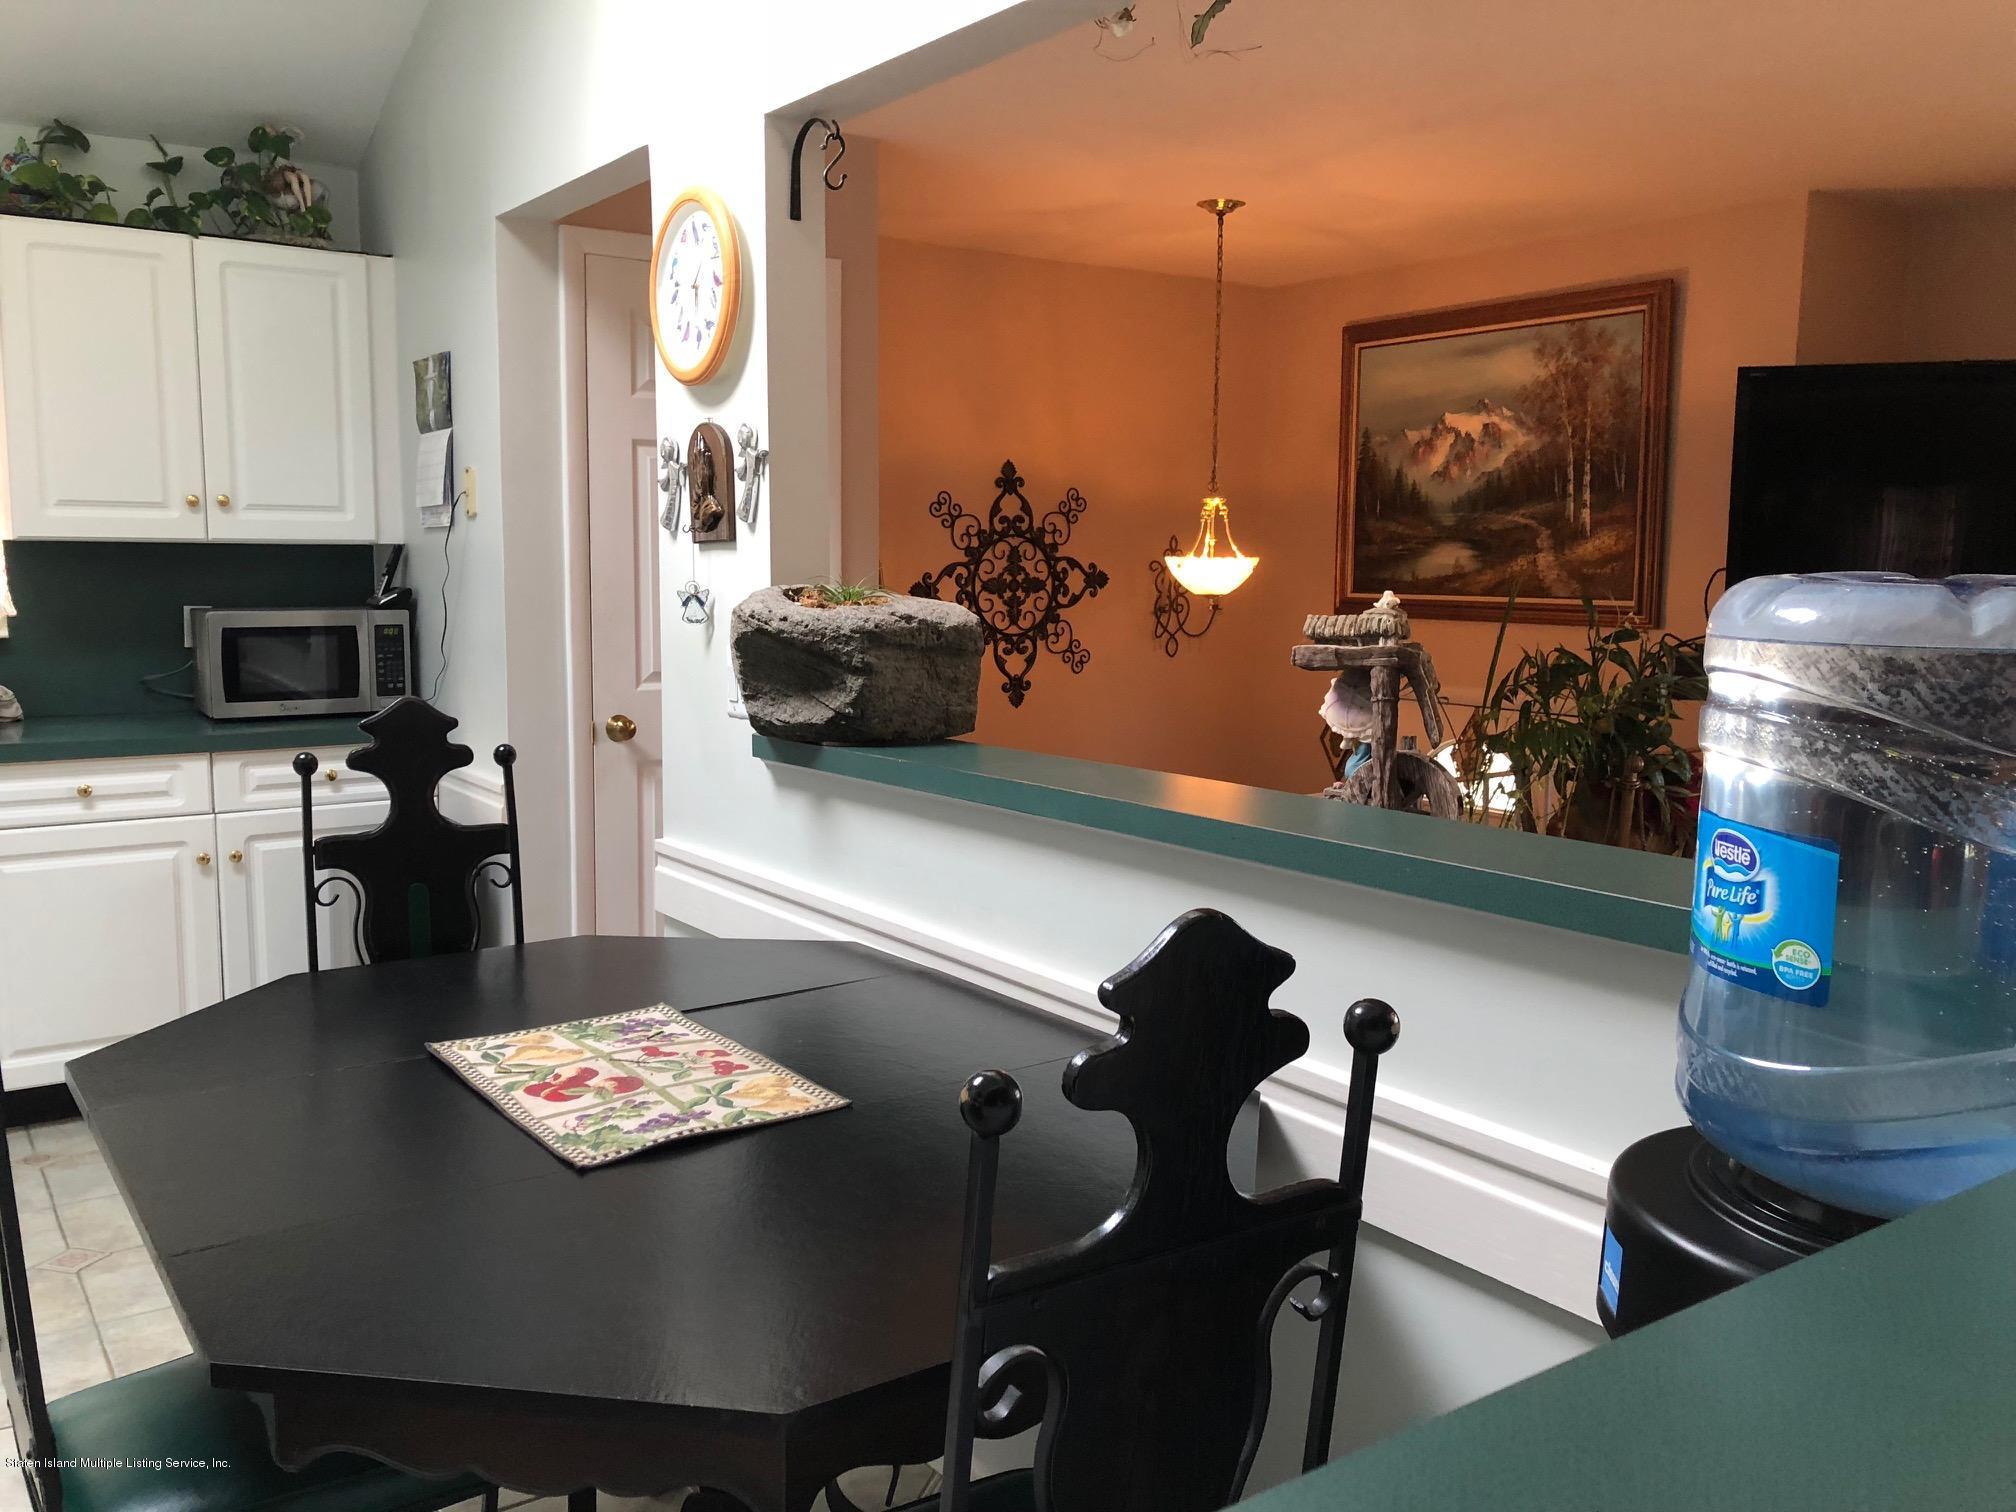 Single Family - Detached 26 Deserre Avenue  Staten Island, NY 10312, MLS-1118007-13